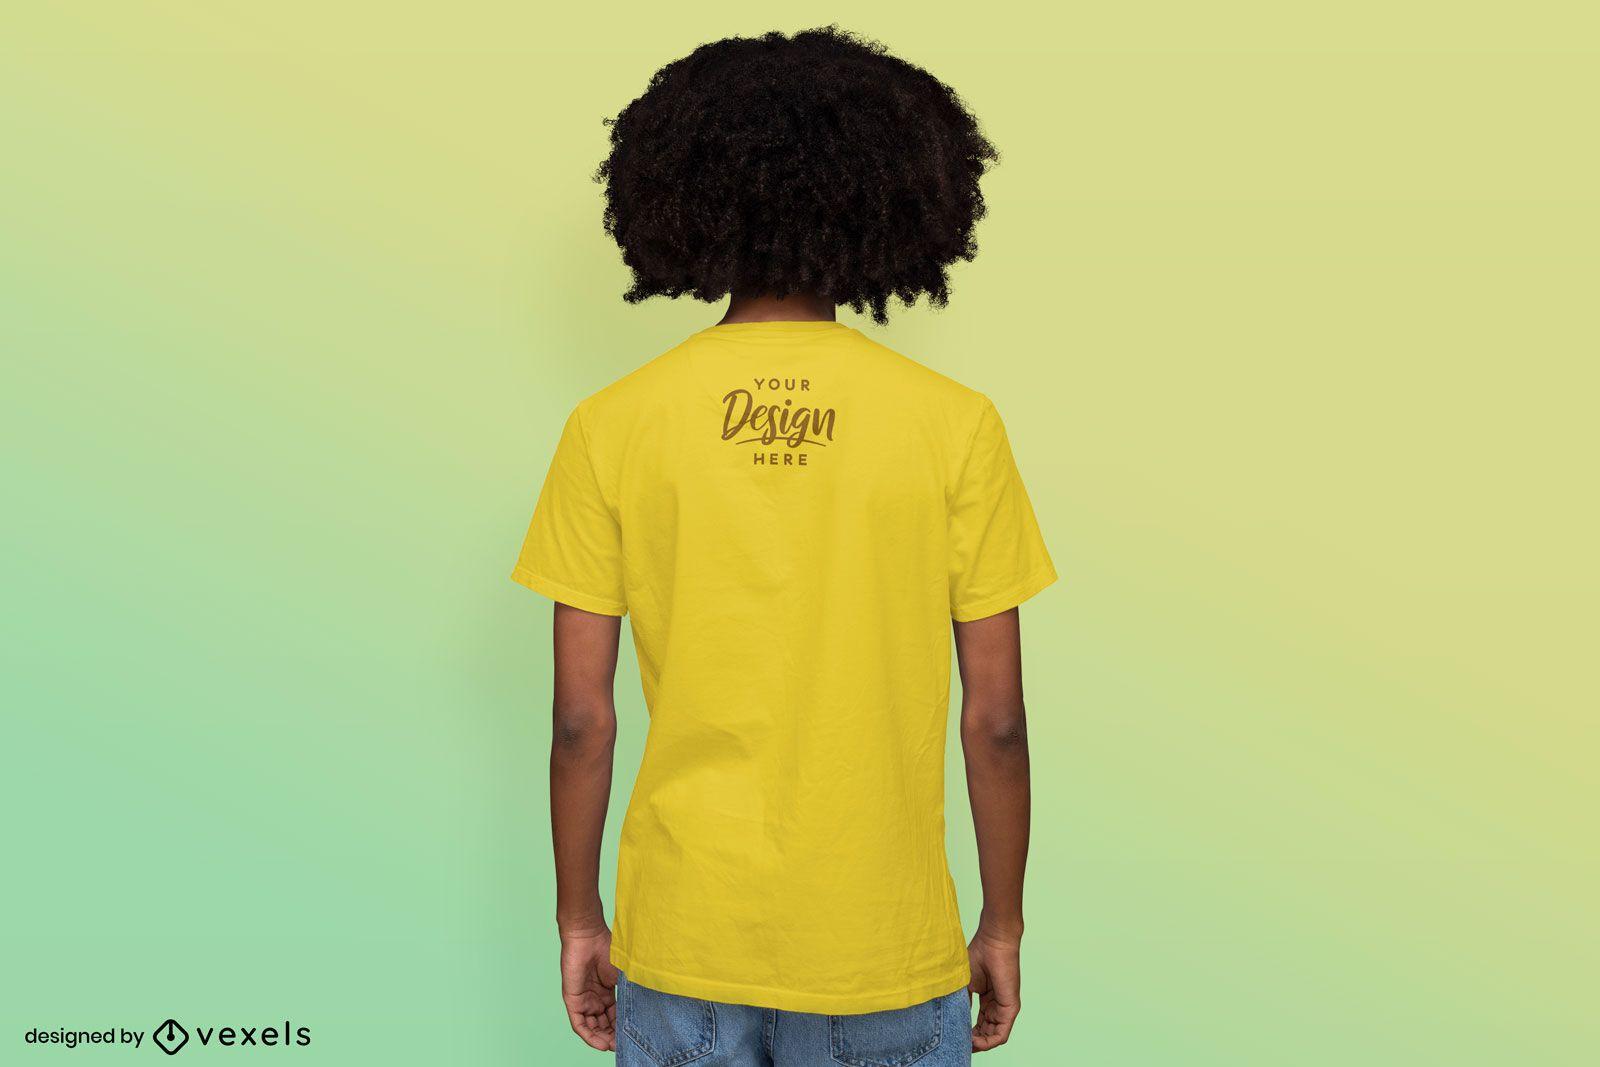 Maquete de camiseta masculina com fundo gradiente invertido